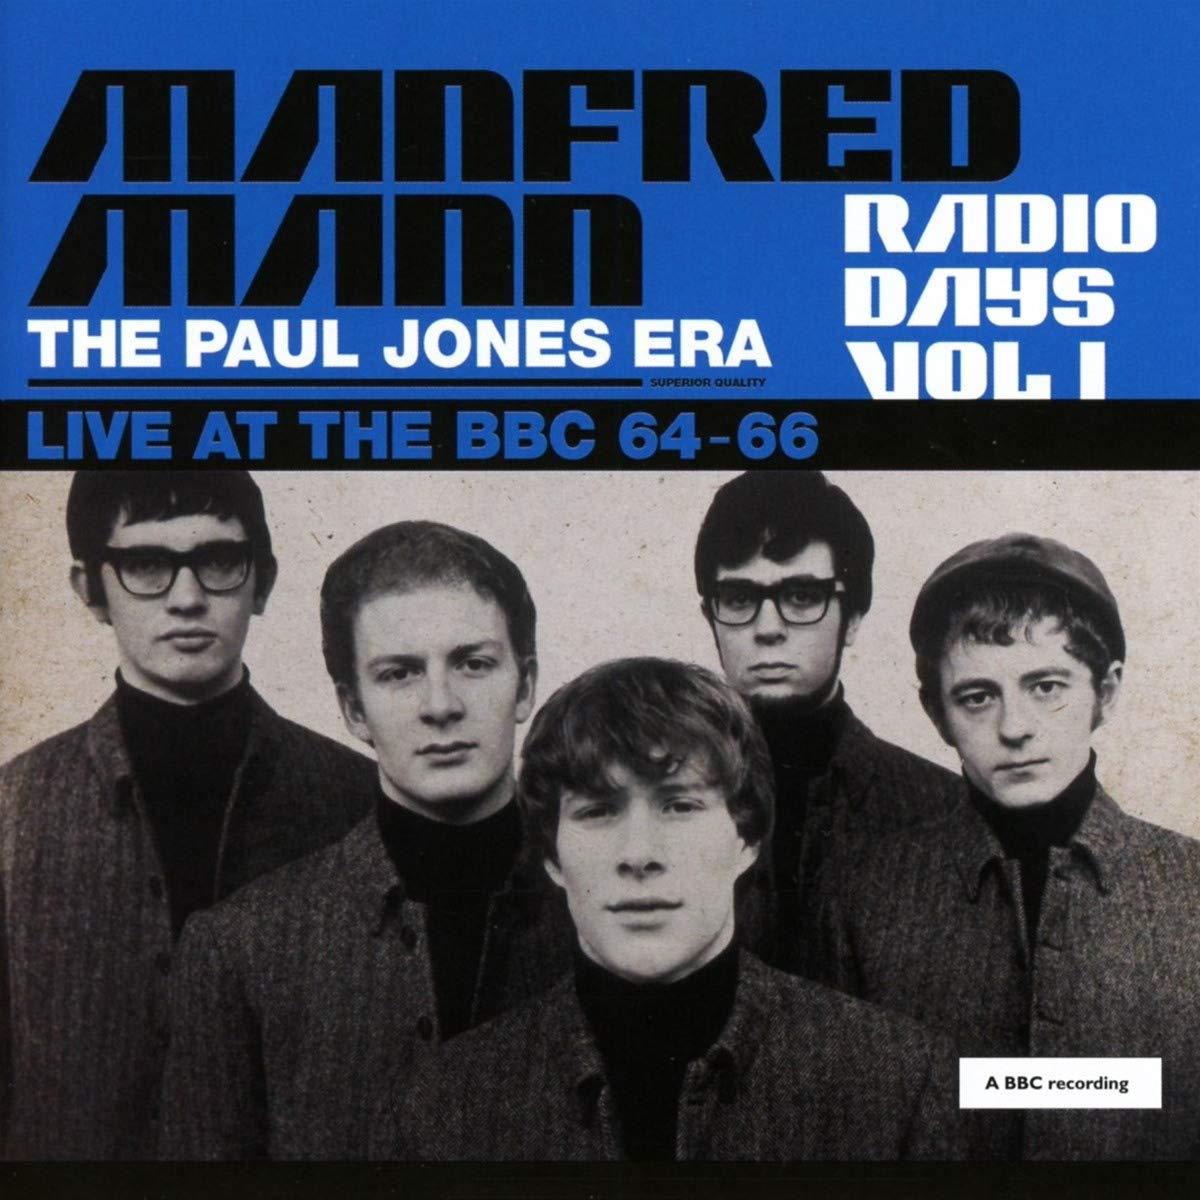 Manfred Mann Radio Days Vol 1 (The Paul Jones Era)